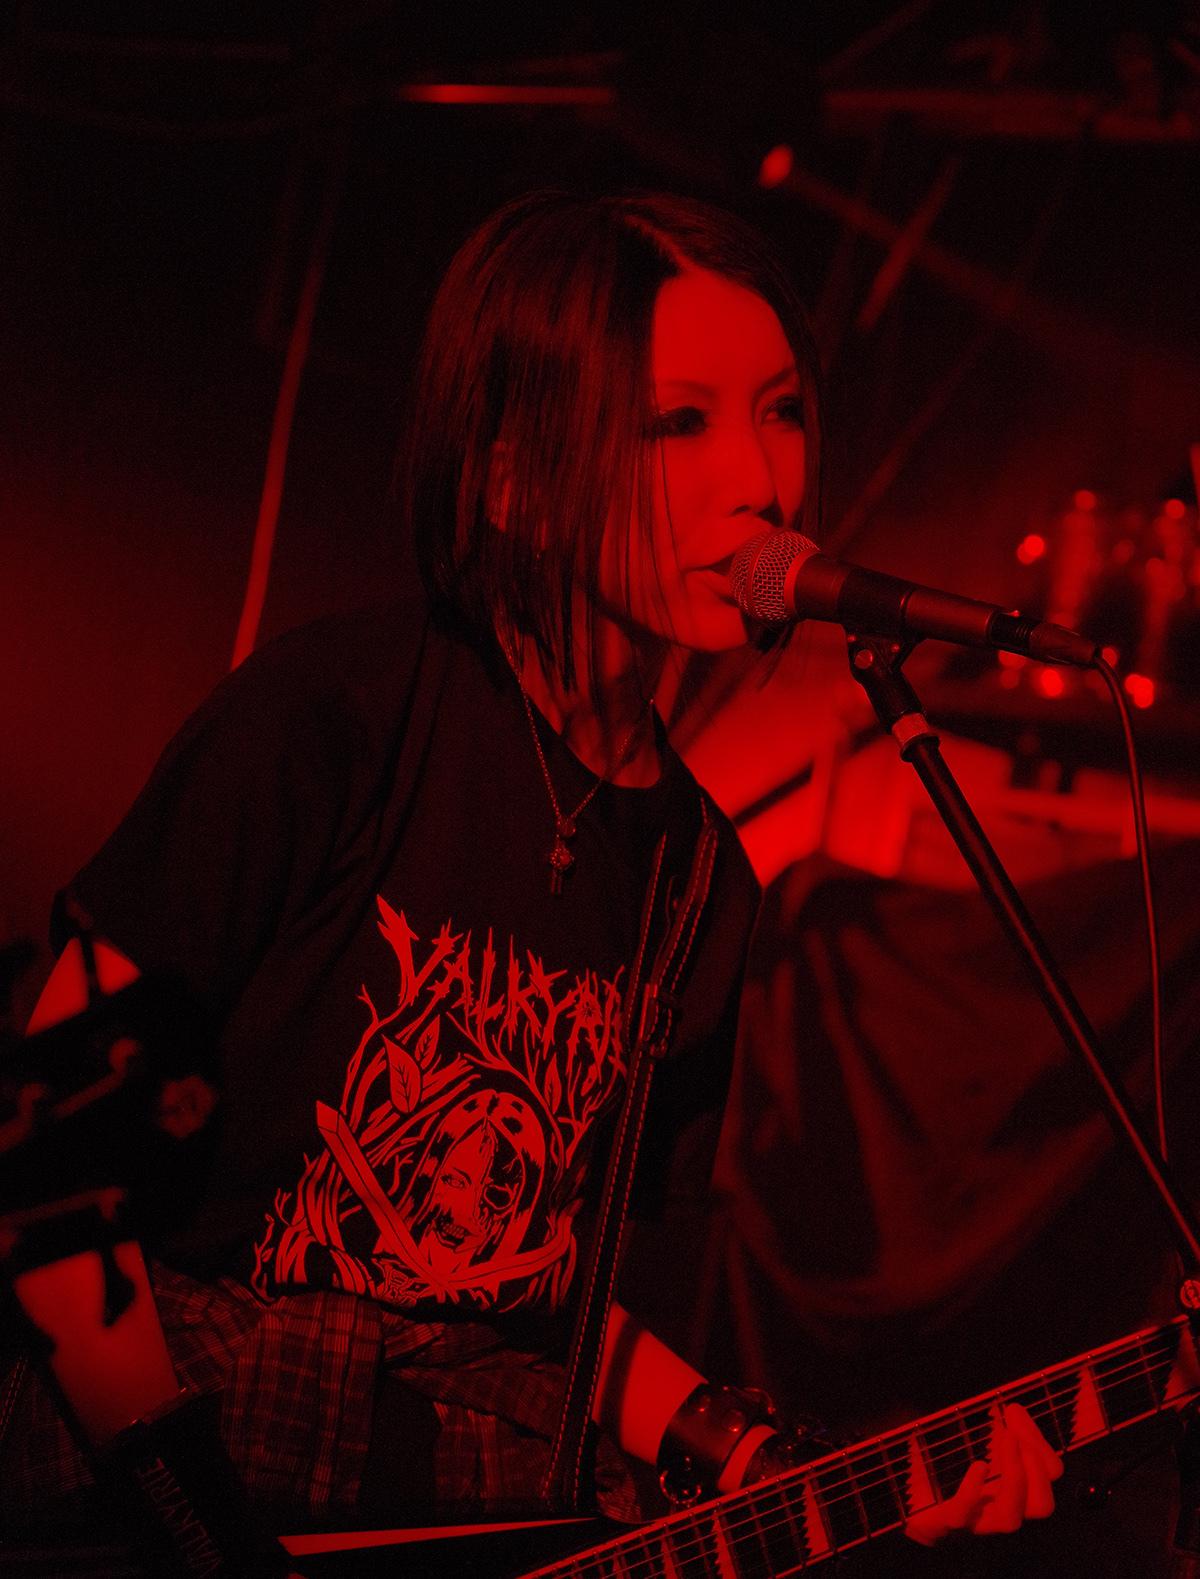 VALKYRIE(ヴァルキューレ)ギターボーカルぶん_20180602SHOVEL-2